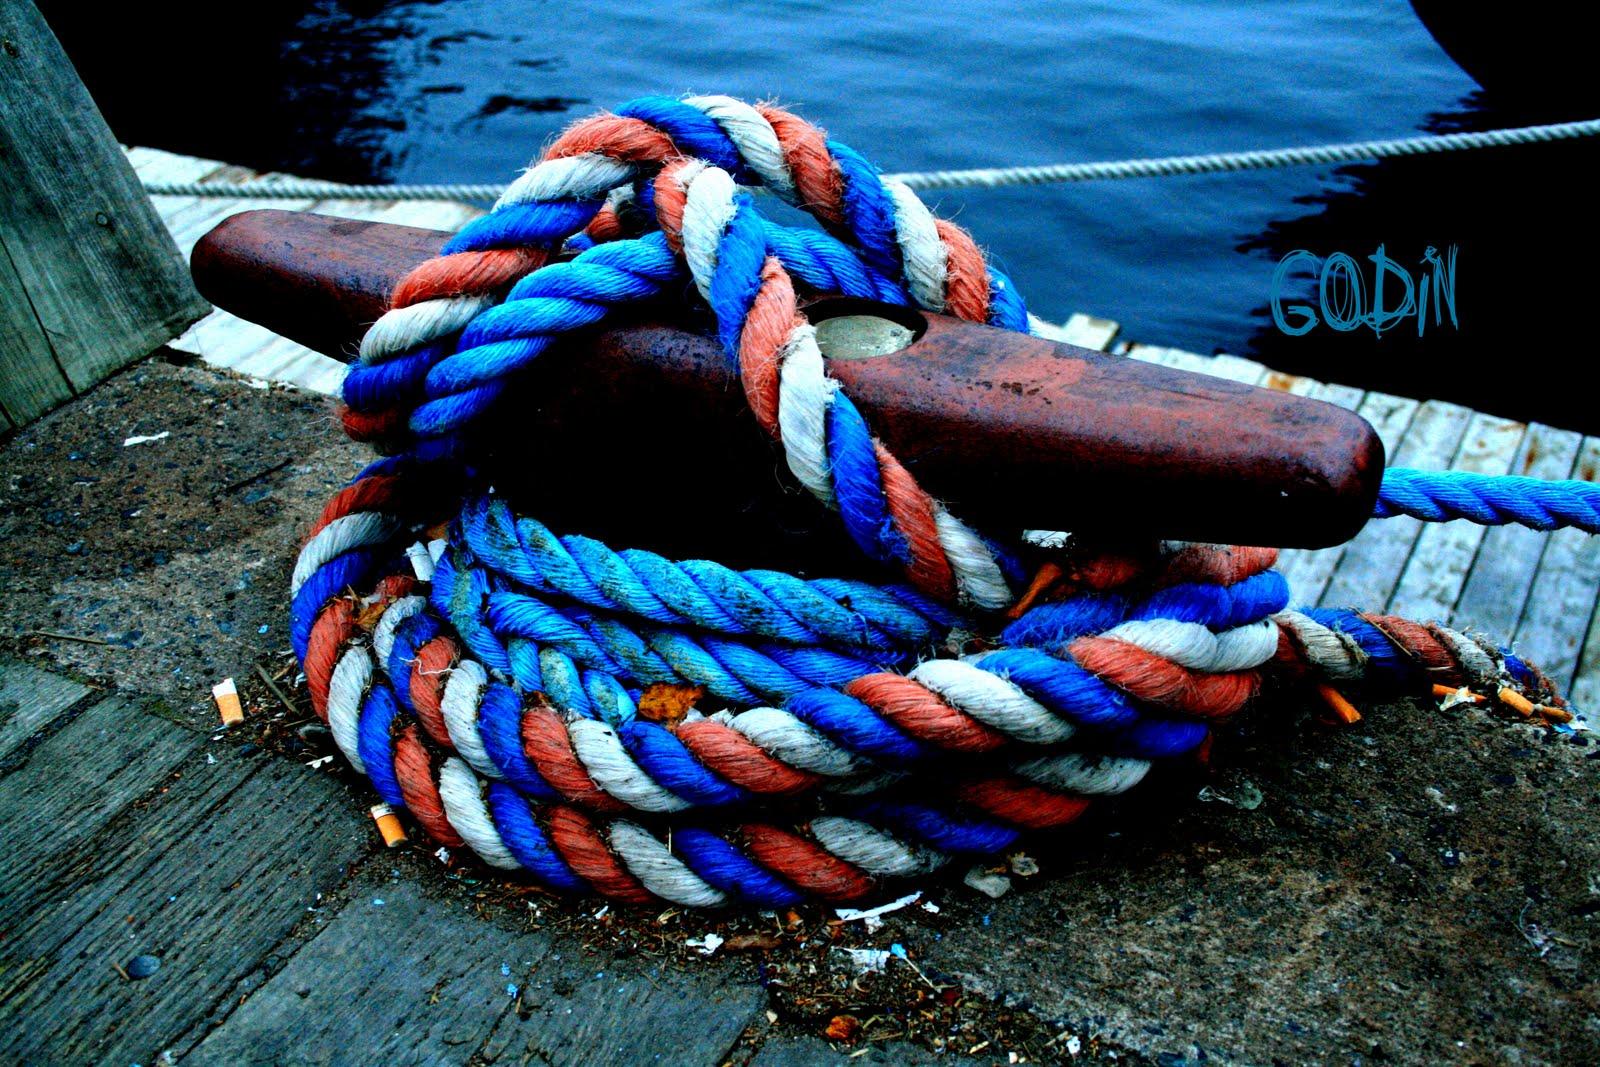 http://1.bp.blogspot.com/-FE_Fxhj9FCA/TlRhlCiuNeI/AAAAAAAACVI/I0tbdTDG-tU/s1600/Godin_Halifax_Nautical.jpg